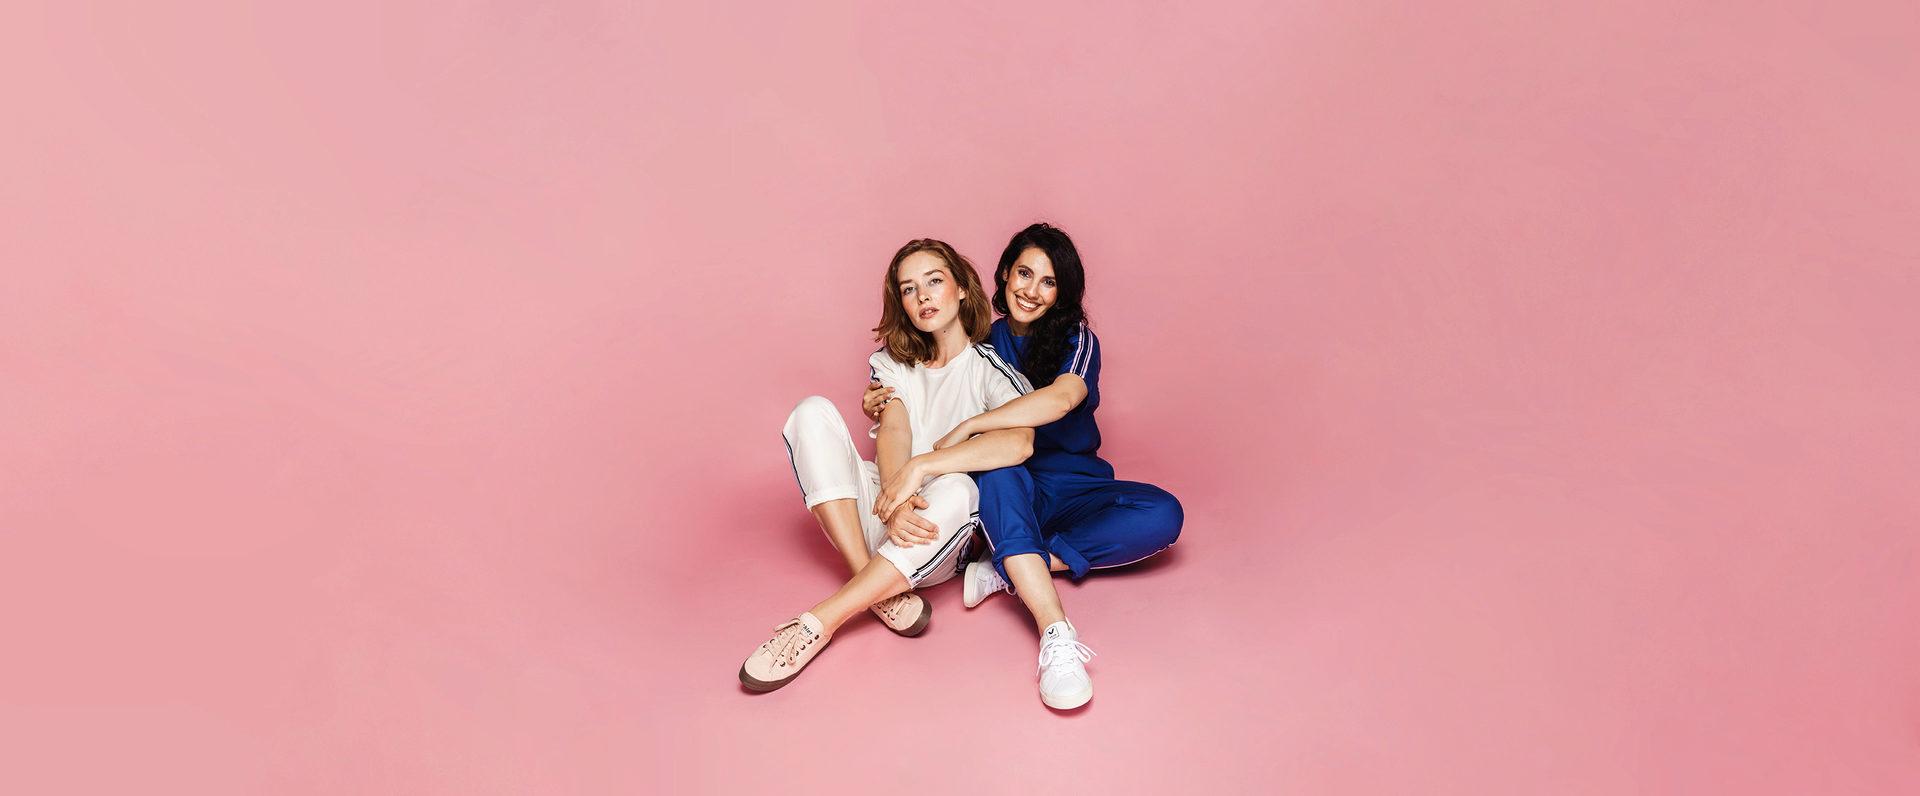 two models posing